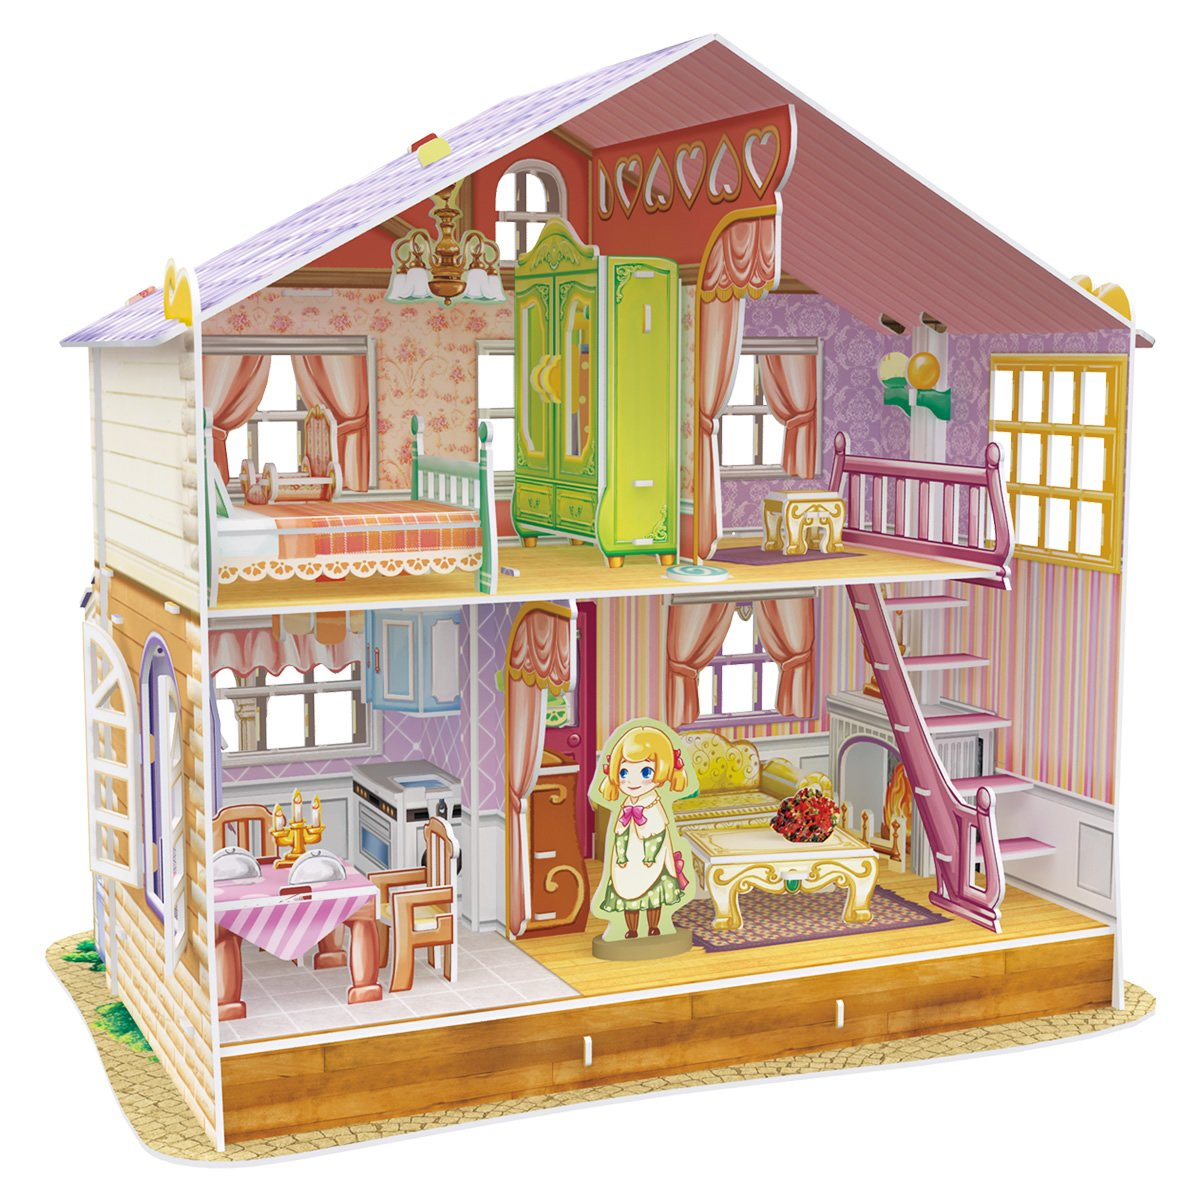 CubicFun Miniature Dollhouse Kits with Furniture,Kids House 3D Puzzle Toys,Sara's Home P678h